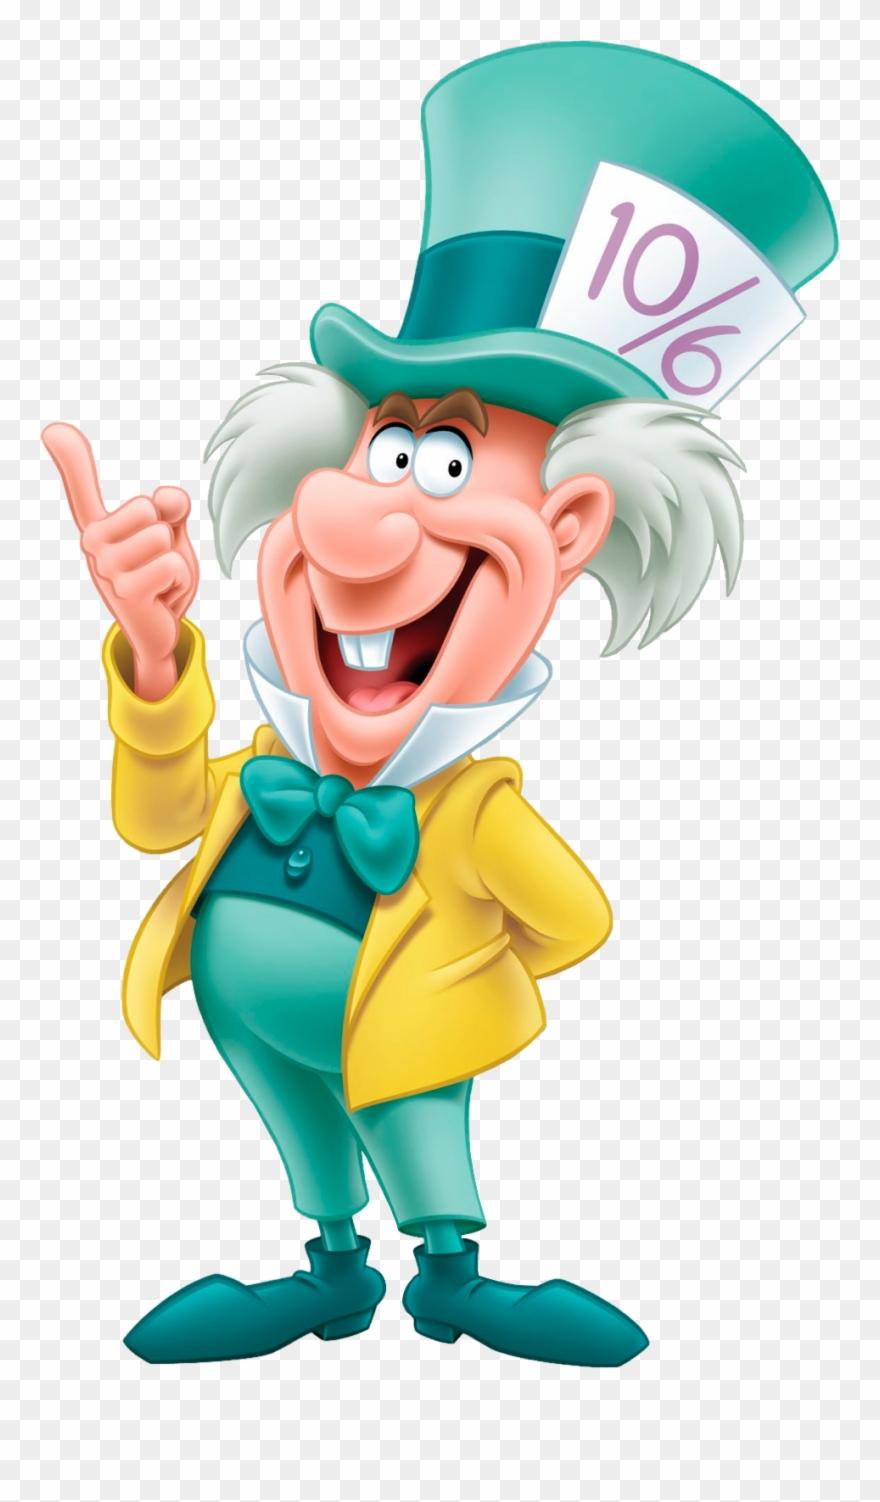 Mad Hatter Disney - Alice In Wonderland Png Clipart ...